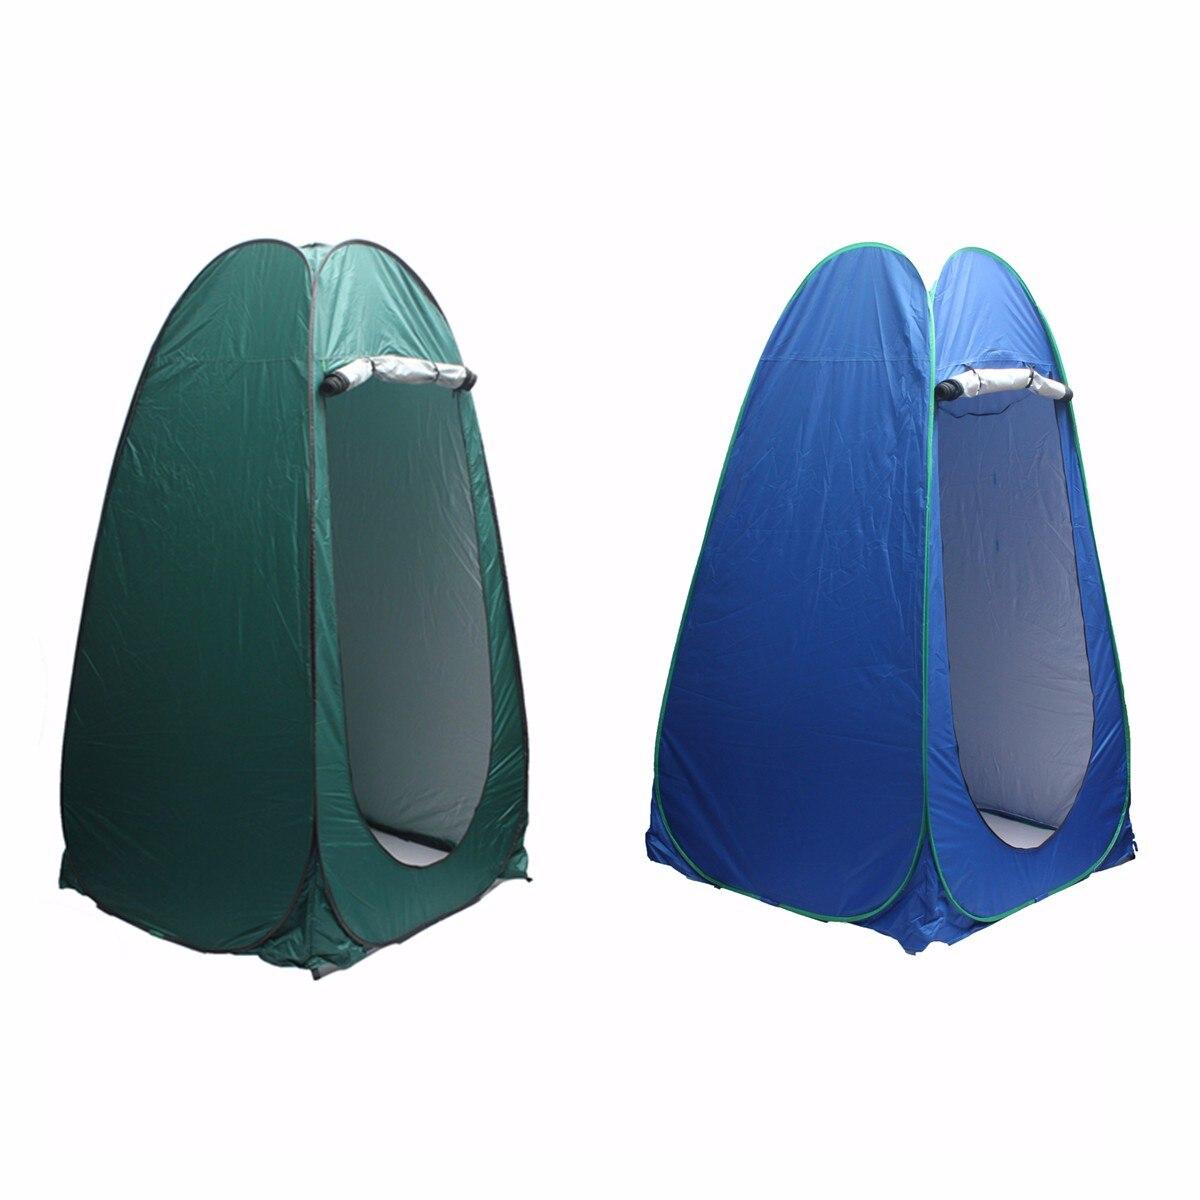 Здесь продается  Outdoor  Automatic Tents Waterproof Beach Fishing Tent Multifunction 1 Person Camping Tents Portable Outdoor Sunshelter  Спорт и развлечения